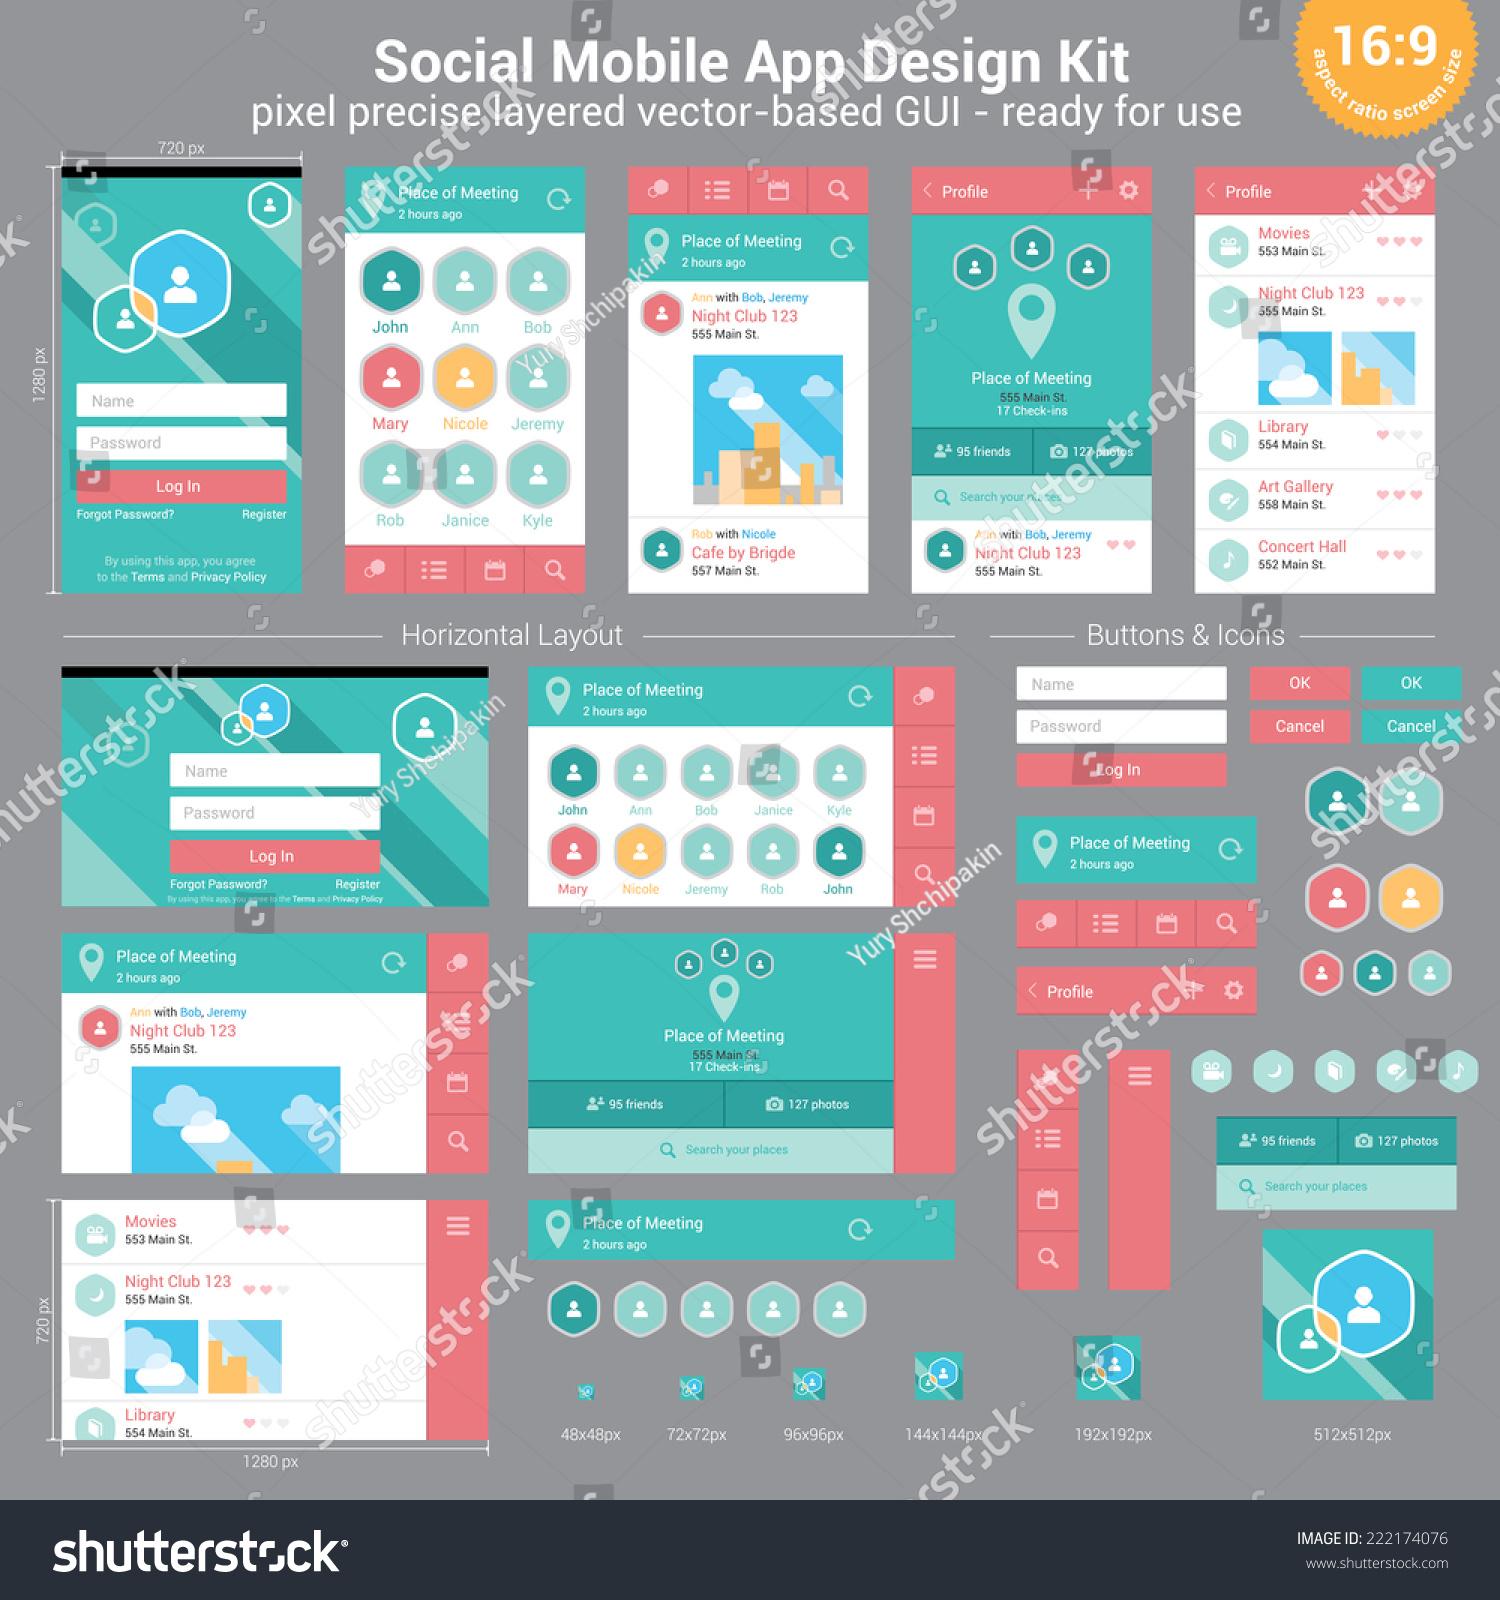 Social Mobile App Design Kit Pixel Stock Vector 222174076